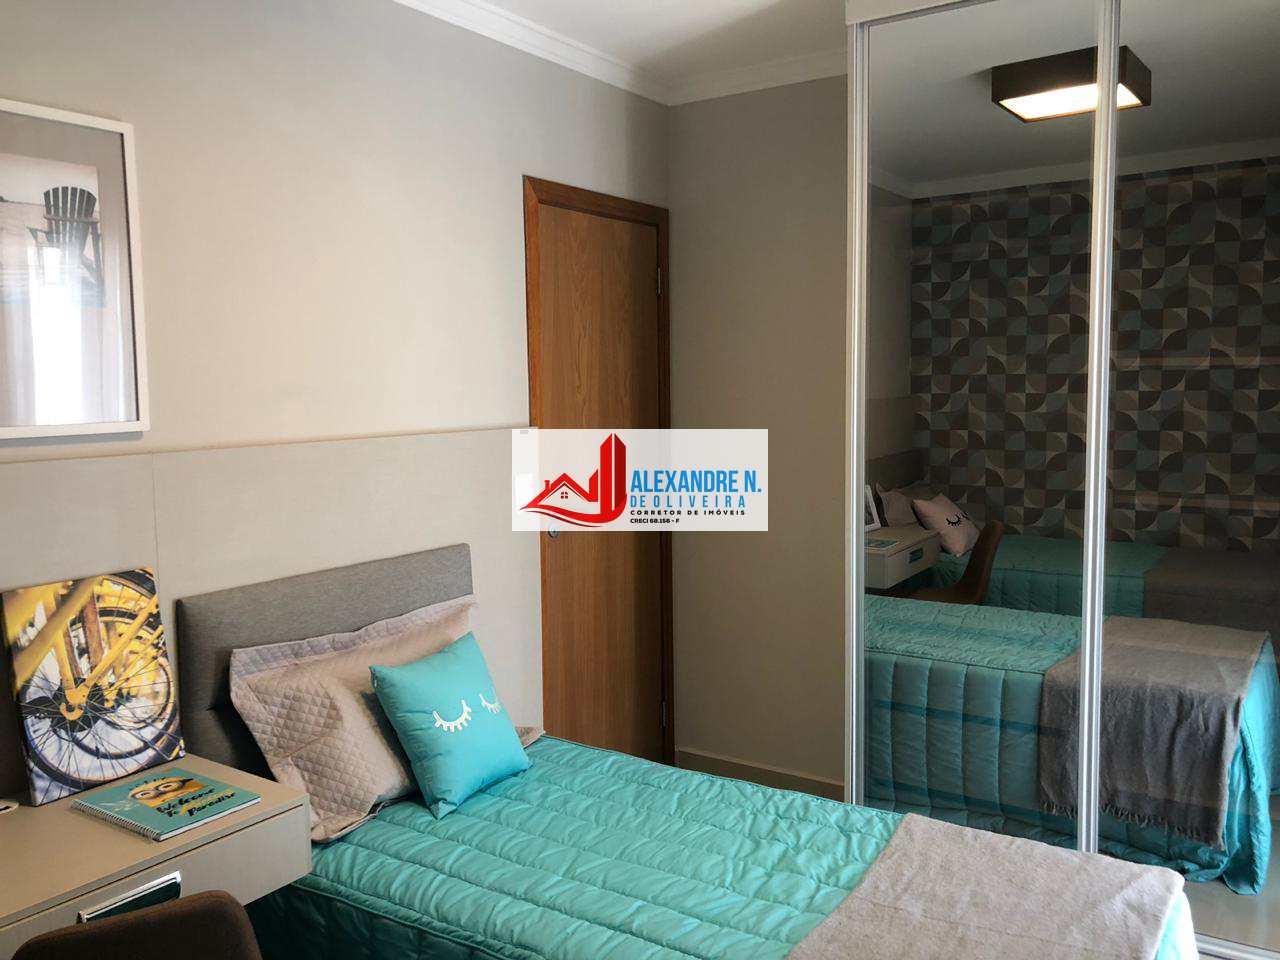 Frente mar,1 dorm, suíte,Praia Grande, Entr. R$ 40 mil, AP00407